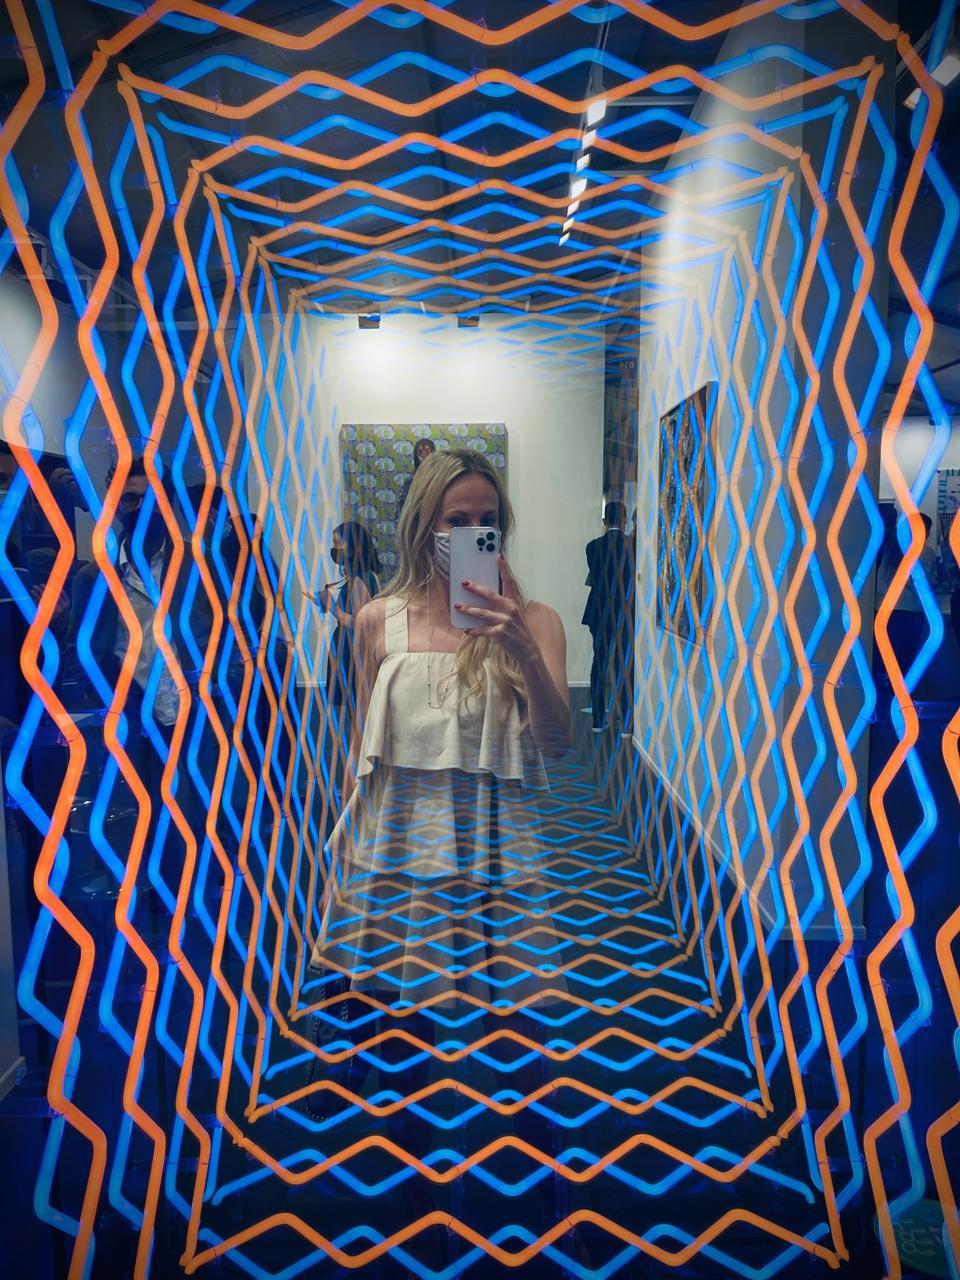 Nel-Olivia Waga mirrored in Ivàn Navarro's artwork ″Clown 2021″- Templon Gallery at Art Dubai 2021